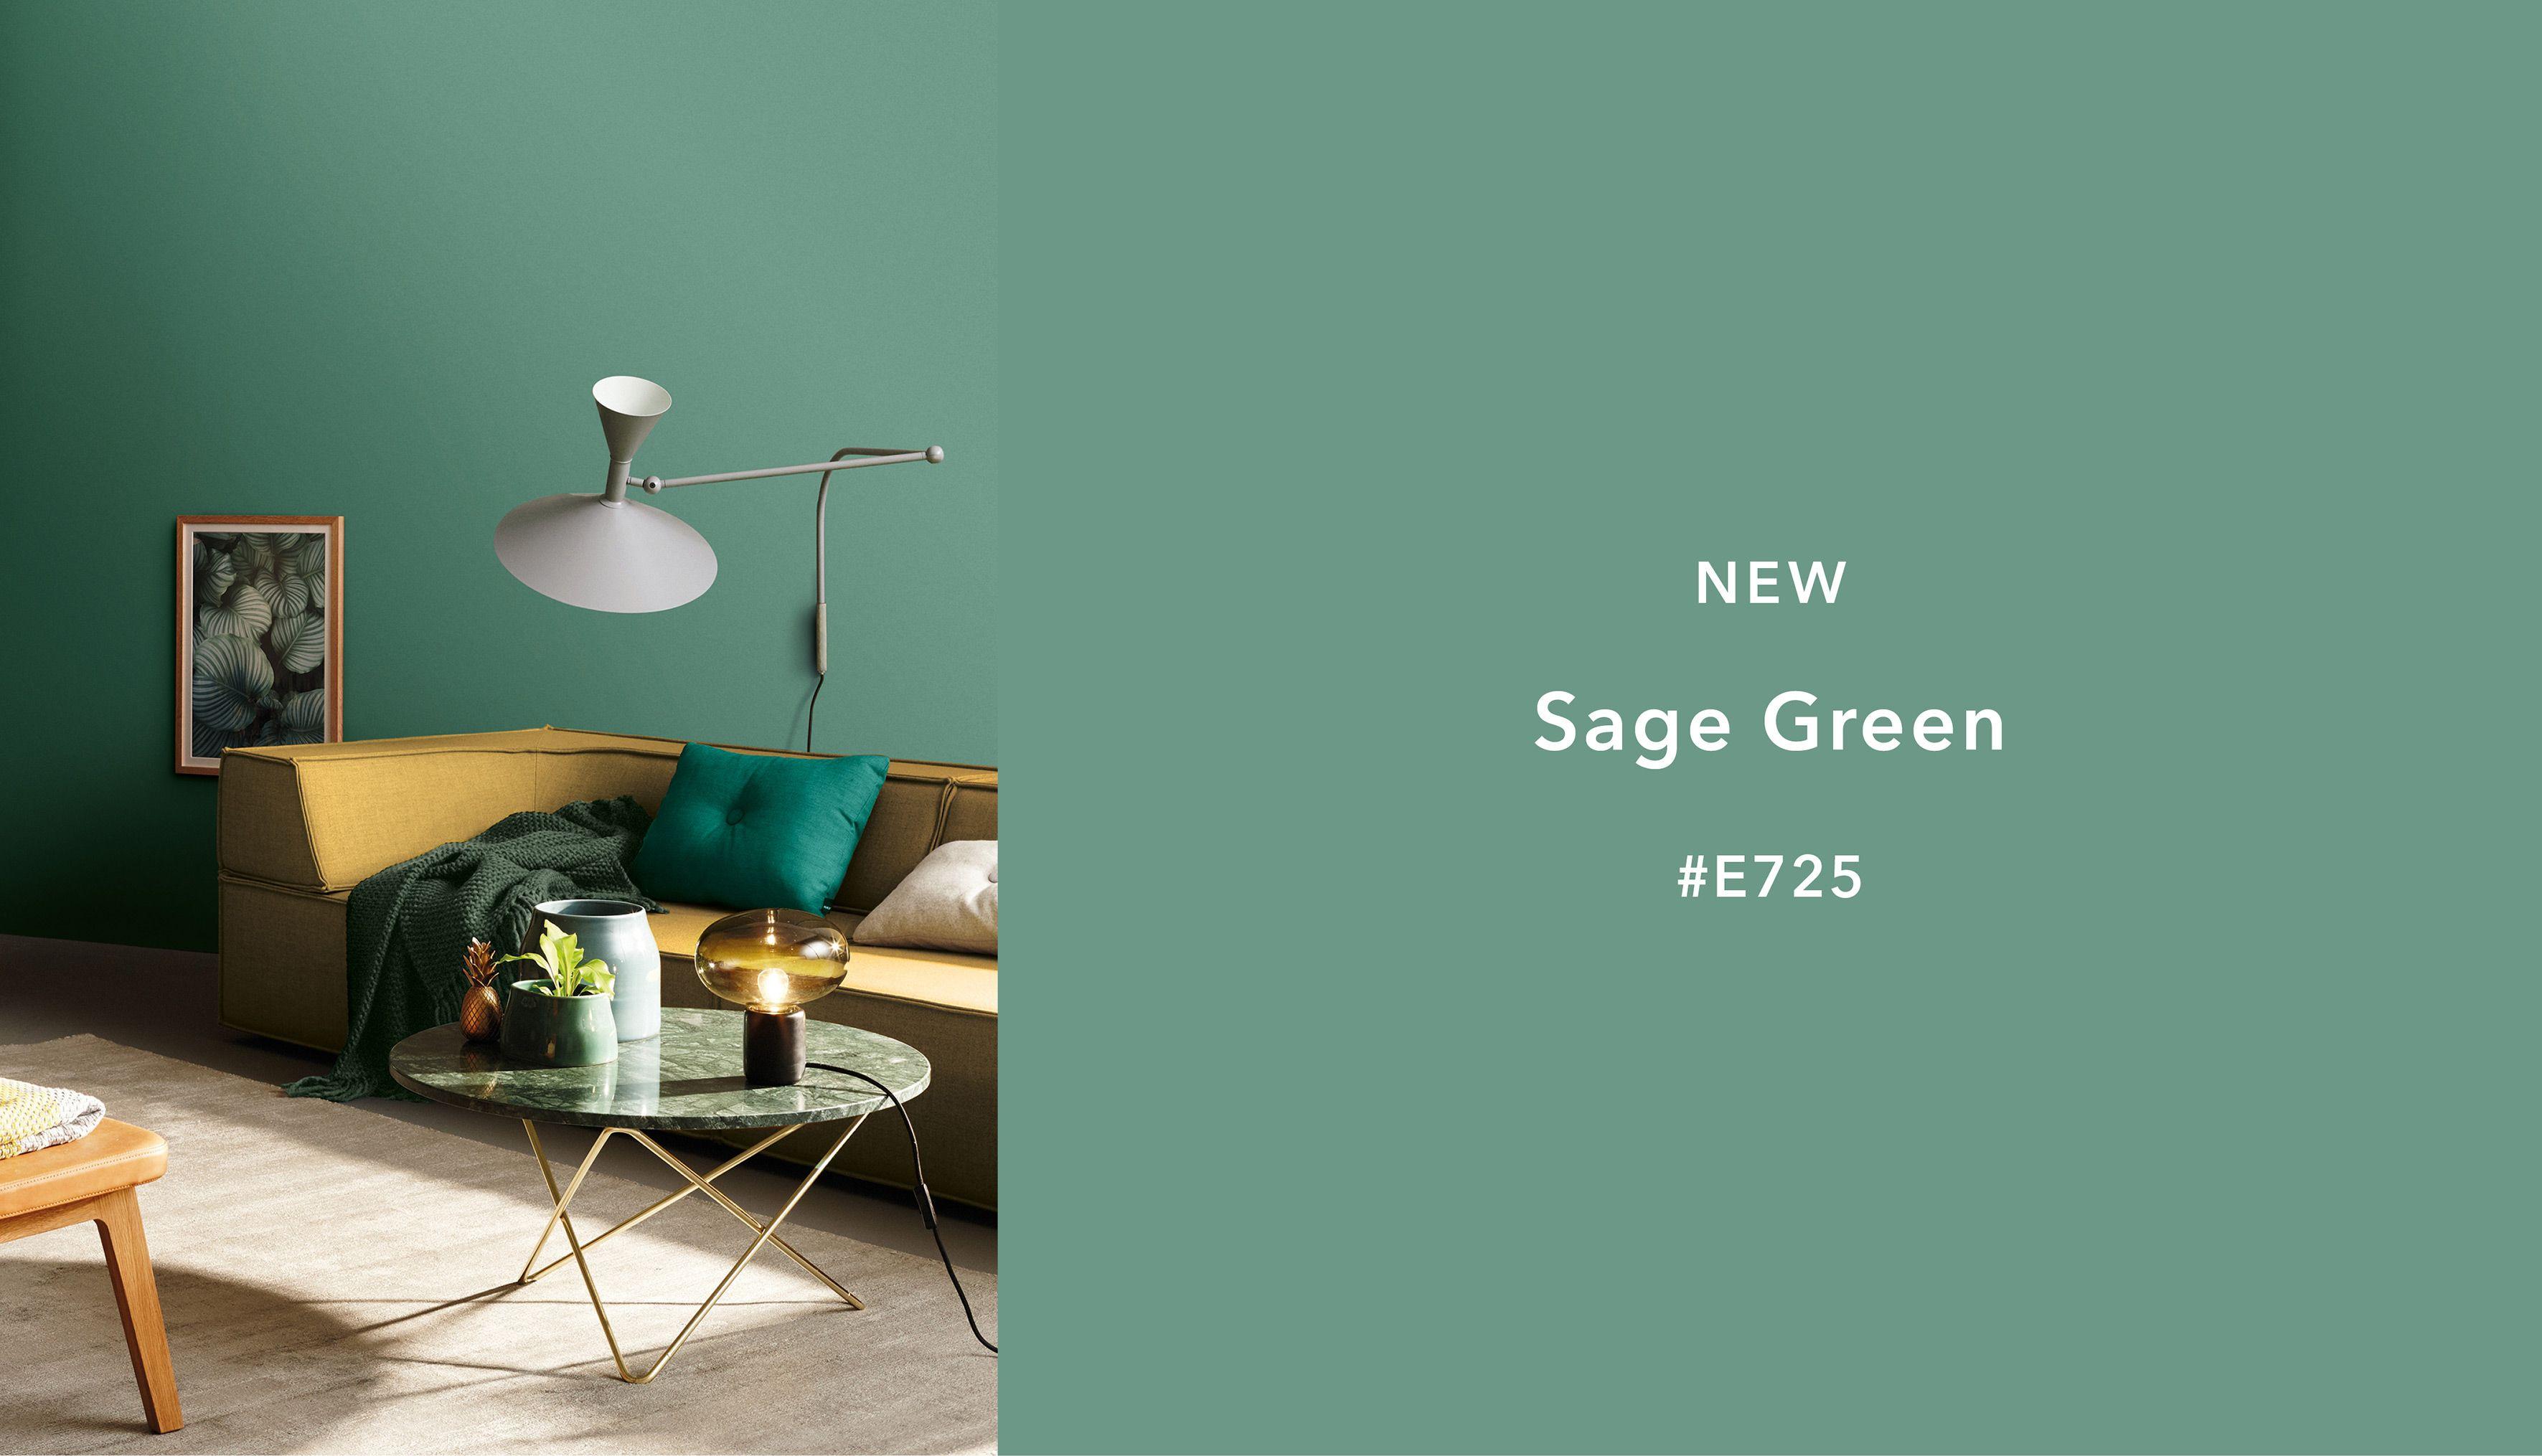 Sage Green #E725 De Cin Valentine Se Inspira En Las